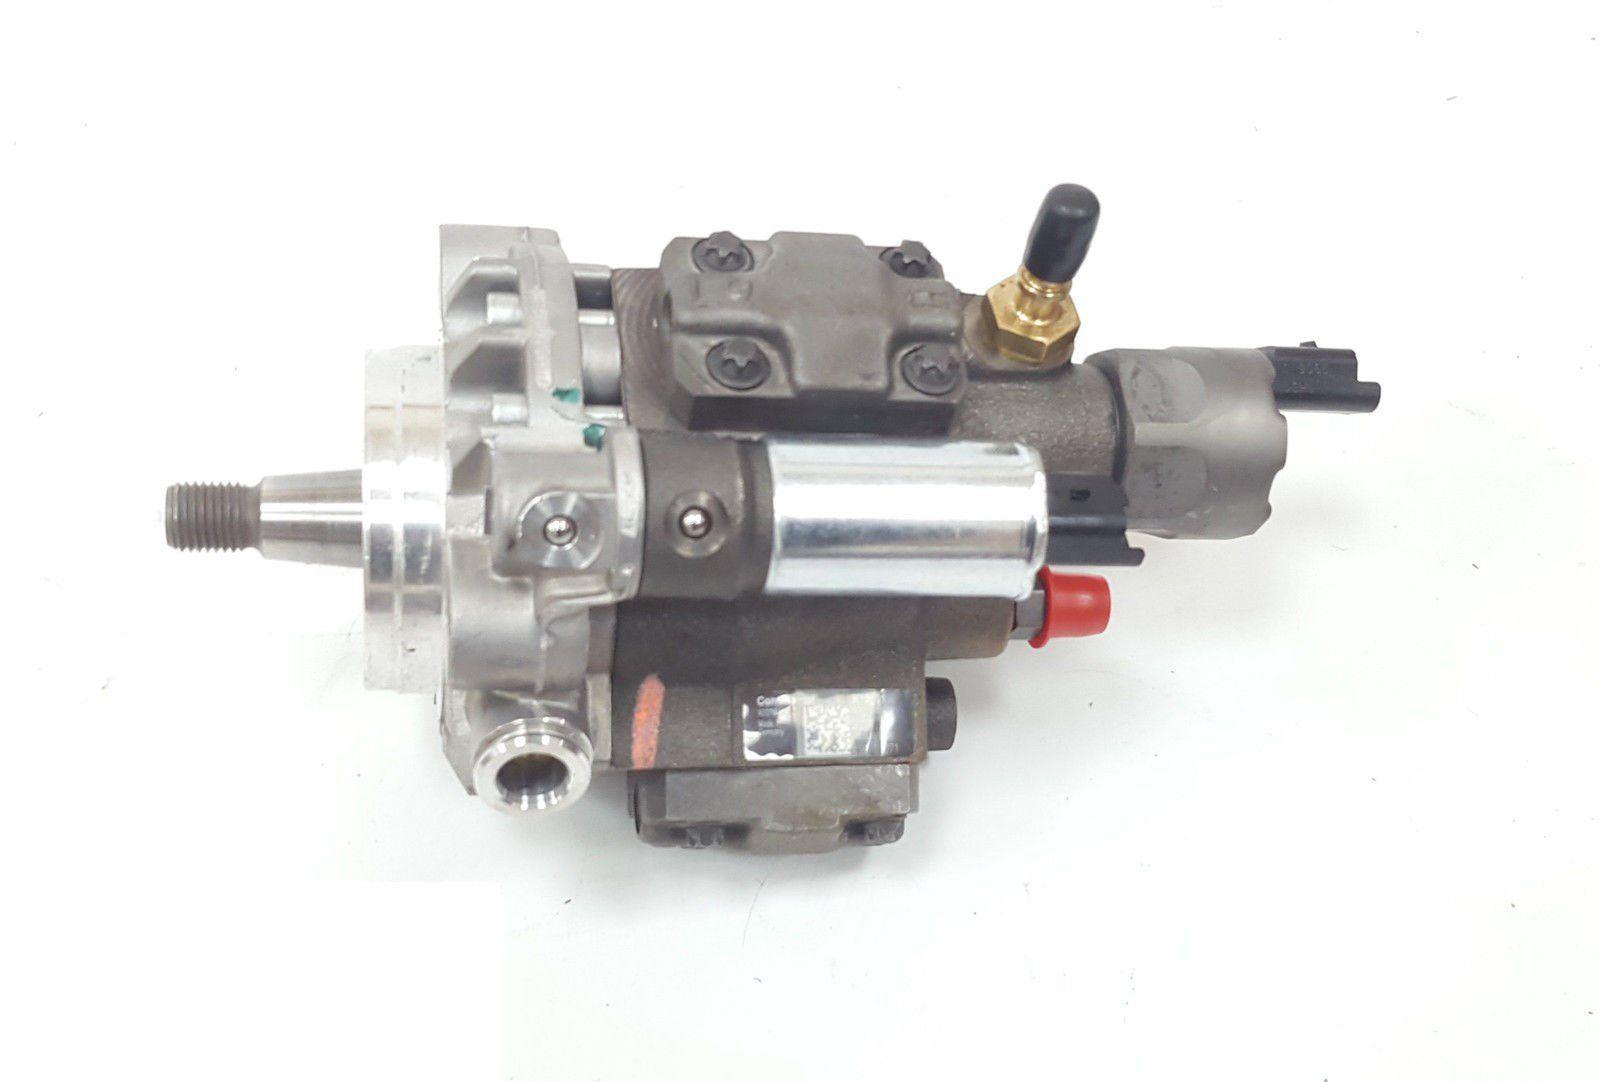 FORD S-MAX SMAX Filtre à huile air carburant 1.8 tdci 2006 sur